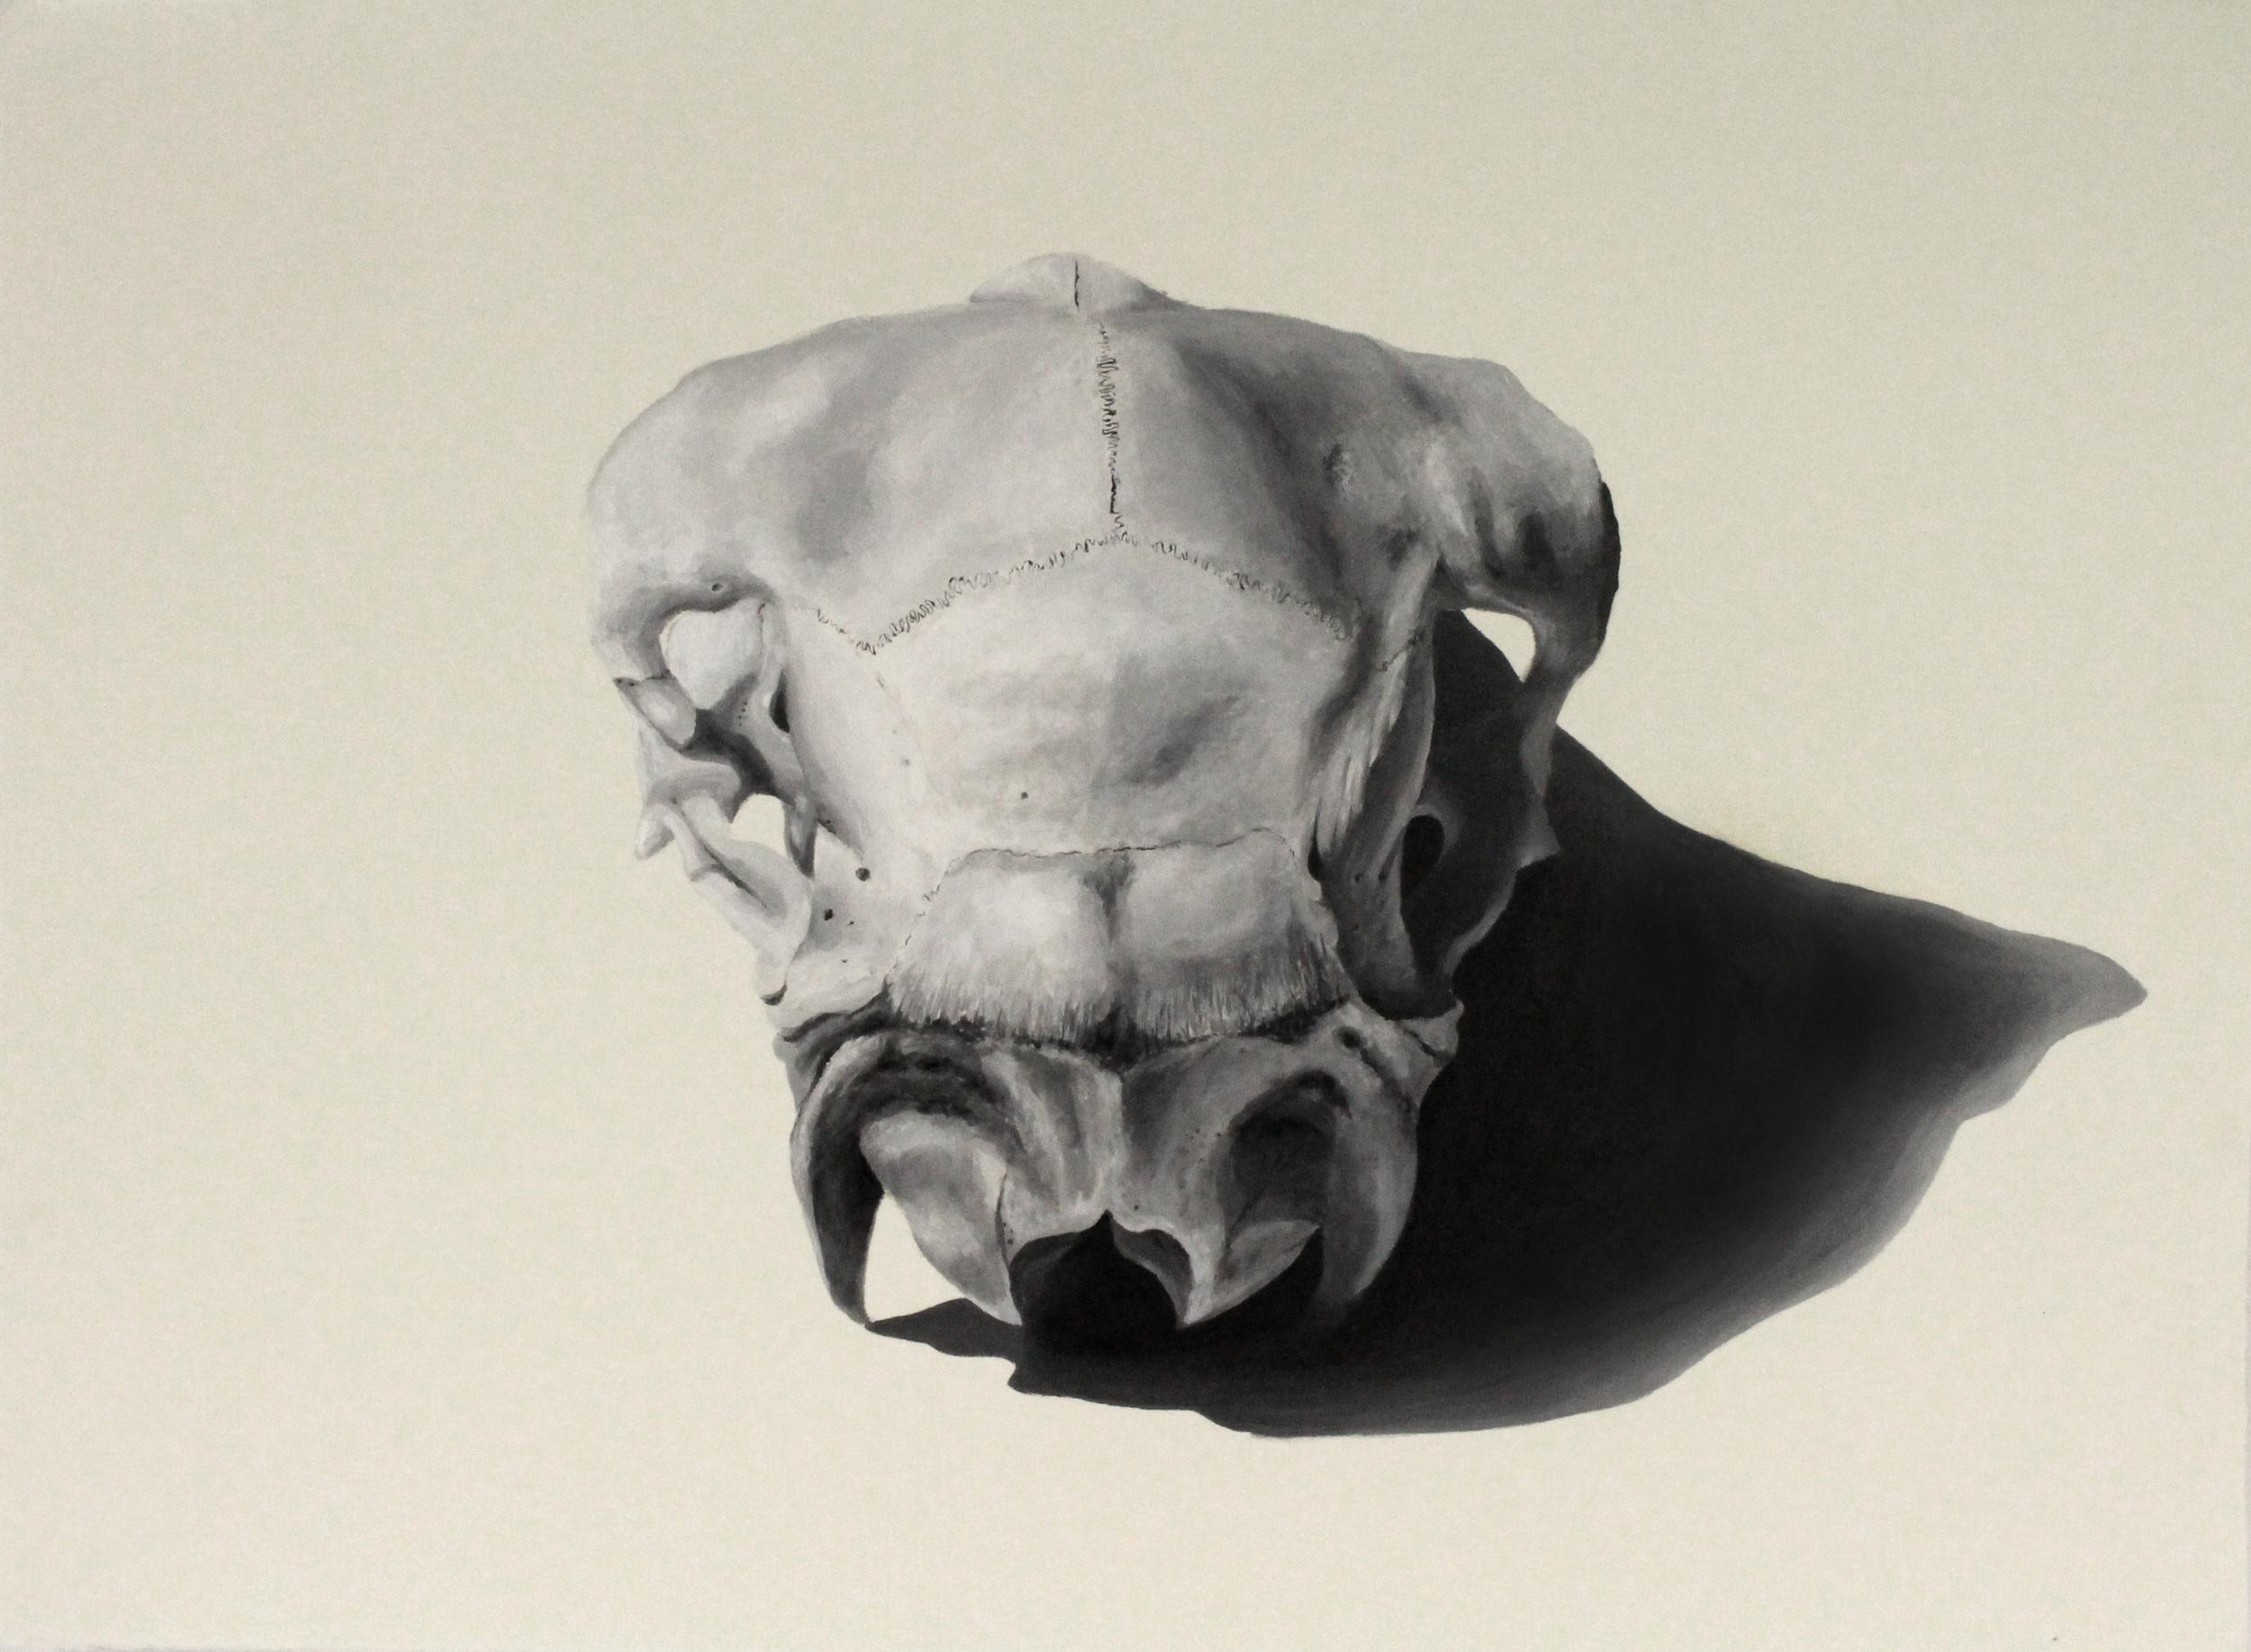 Acrylic on Paper (56x76cm)